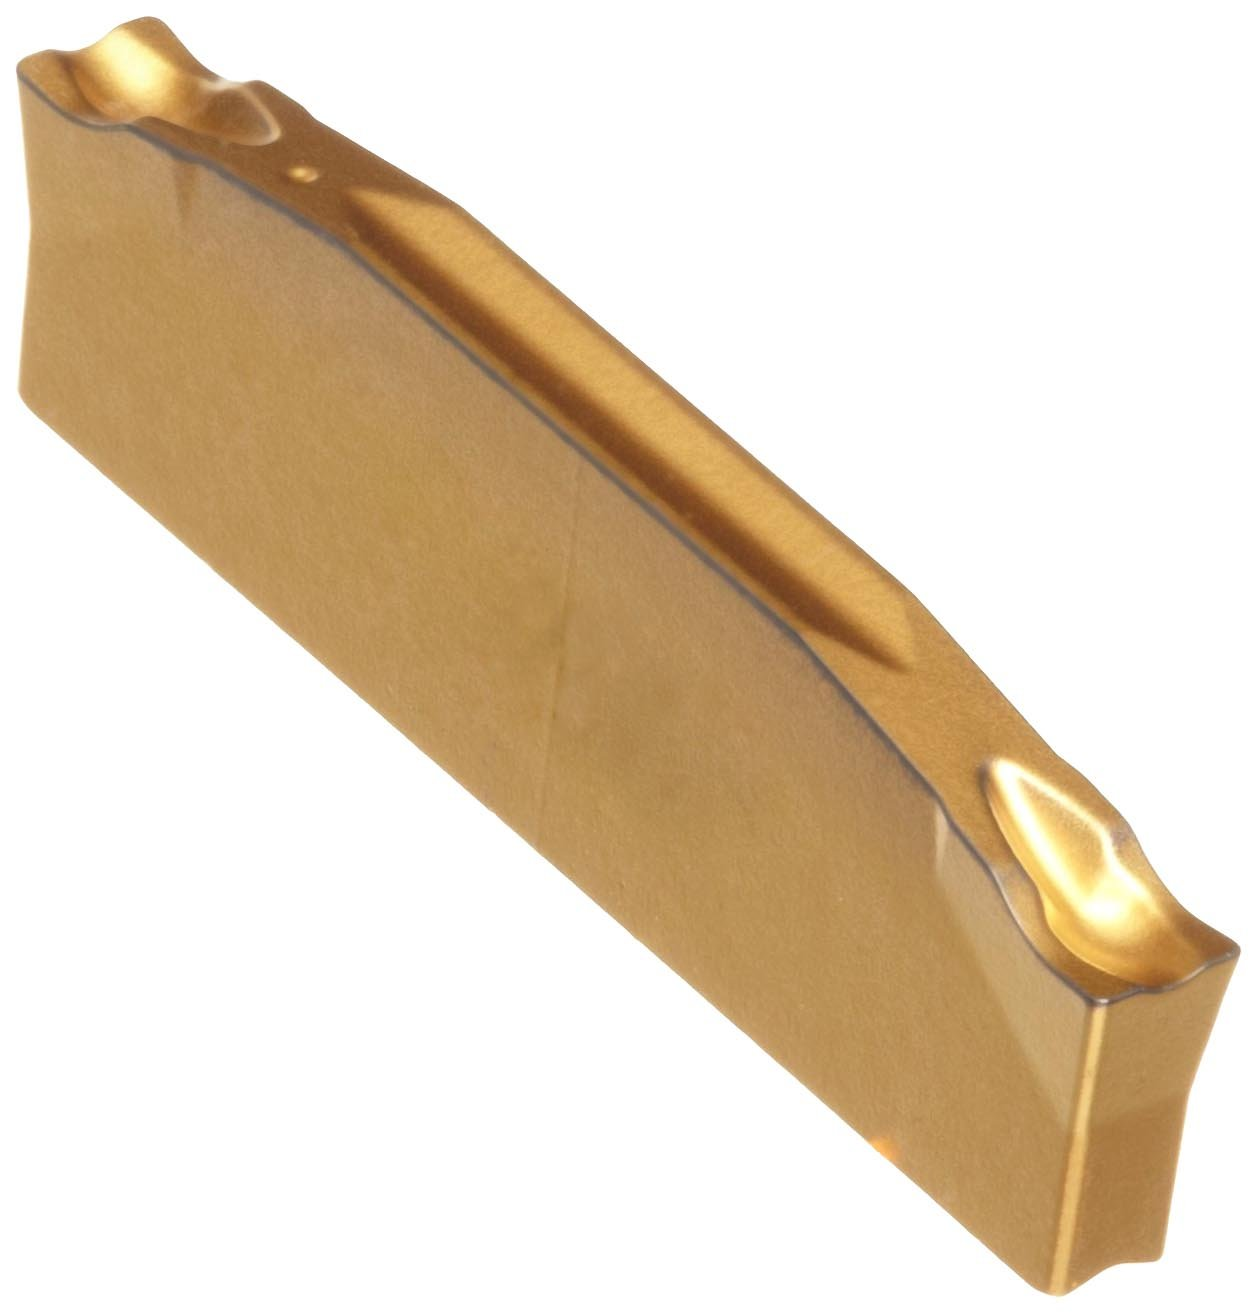 N123G2-0300-0002-CM GC2135 Grade Sandvik Coromant CoroCut 2-Edge Carbide Parting Insert Pack of 10 G Insert Seat Size 0.0079 Corner Radius 2 Cutting Edges Multi-Layer Coating CM Chipbreaker